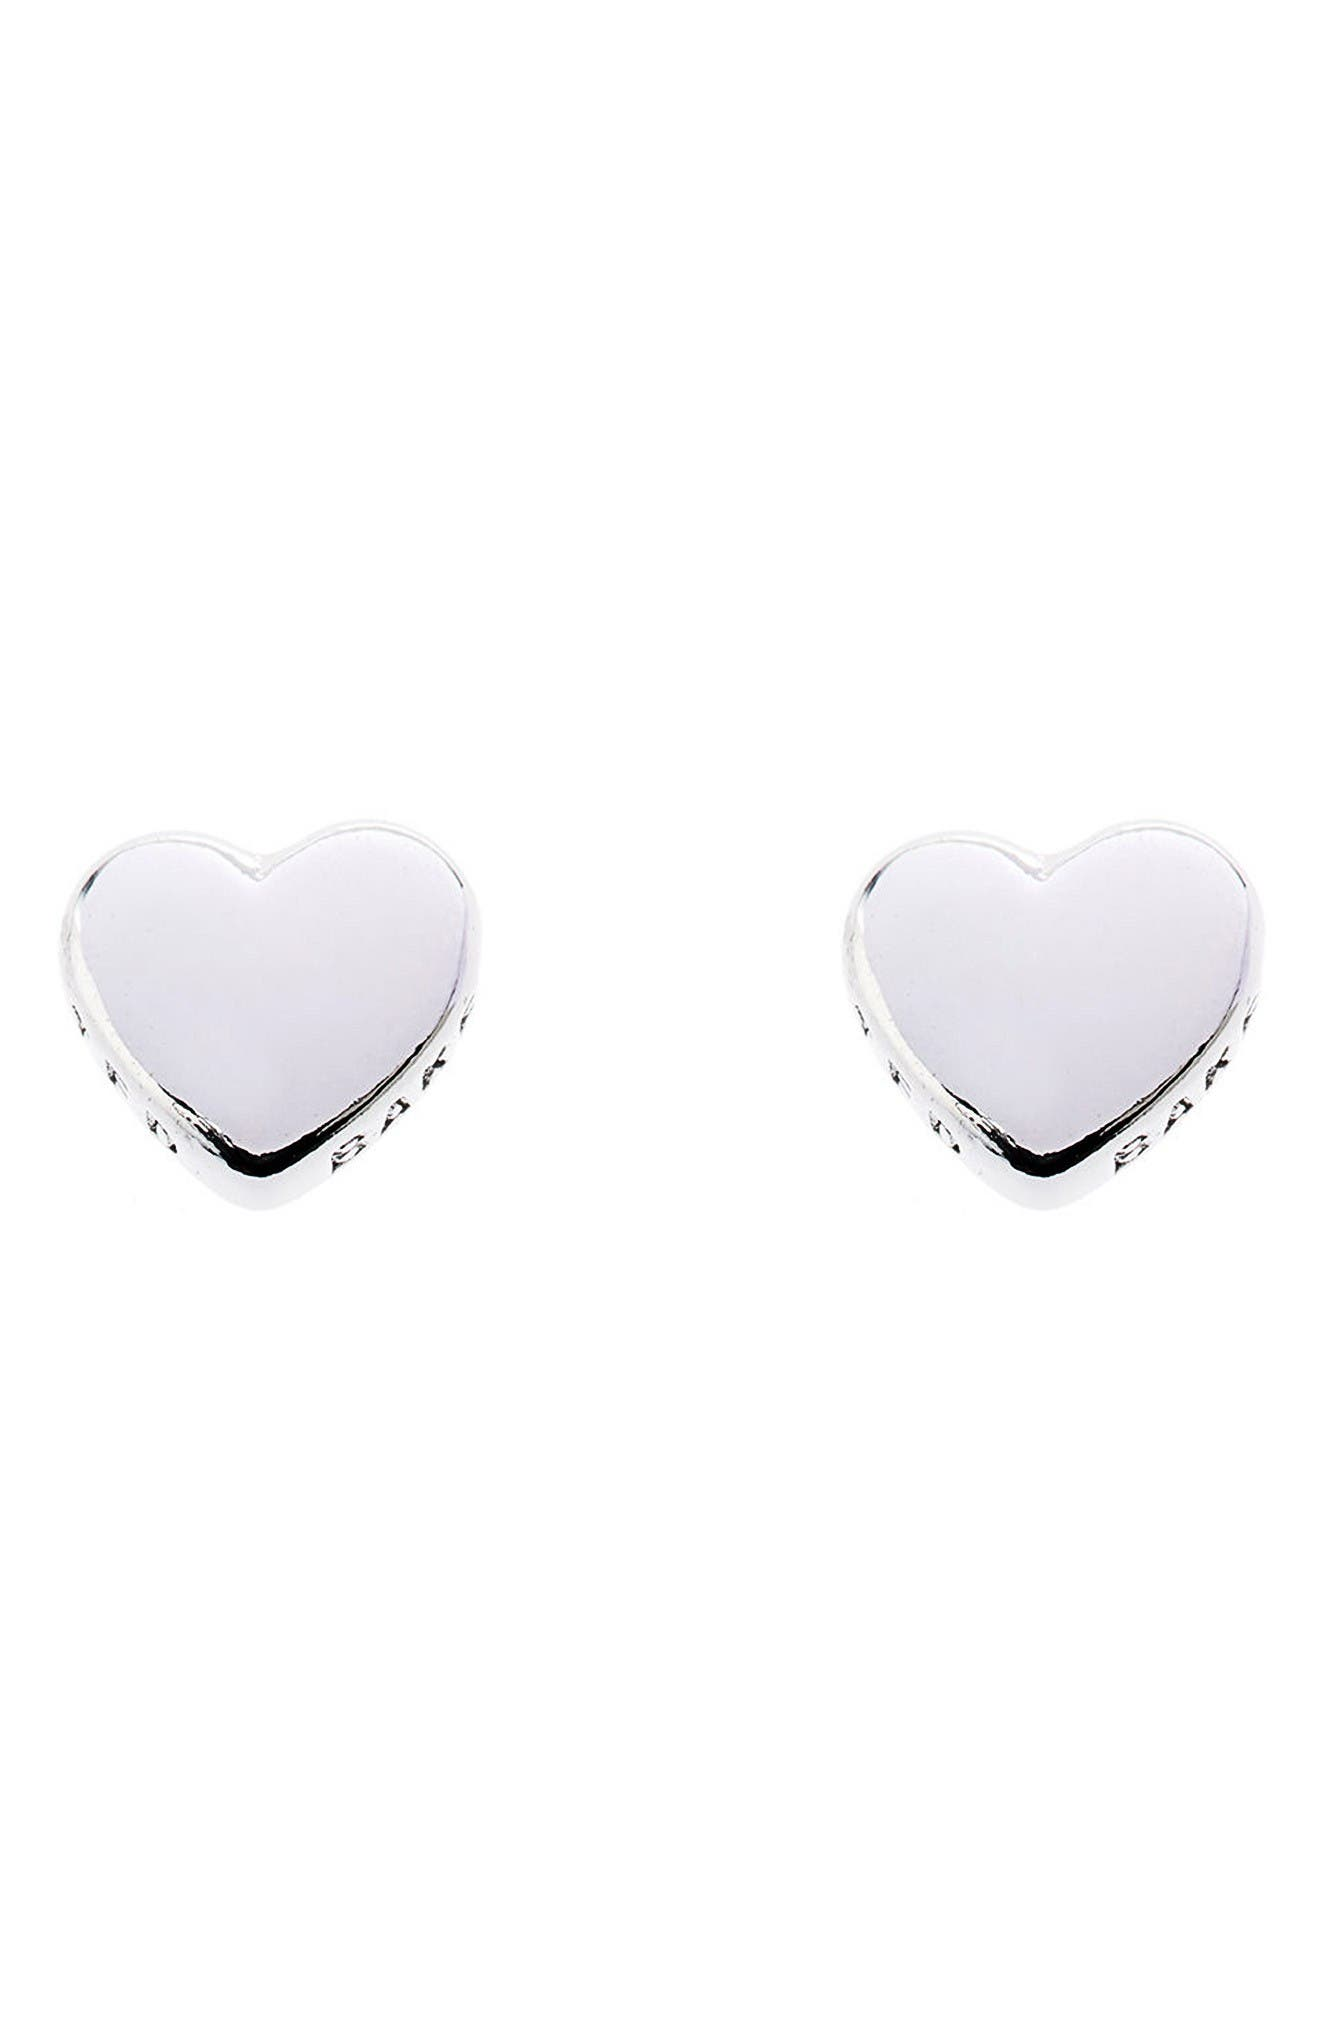 Sweetheart Stud Earrings,                         Main,                         color, Silver Color